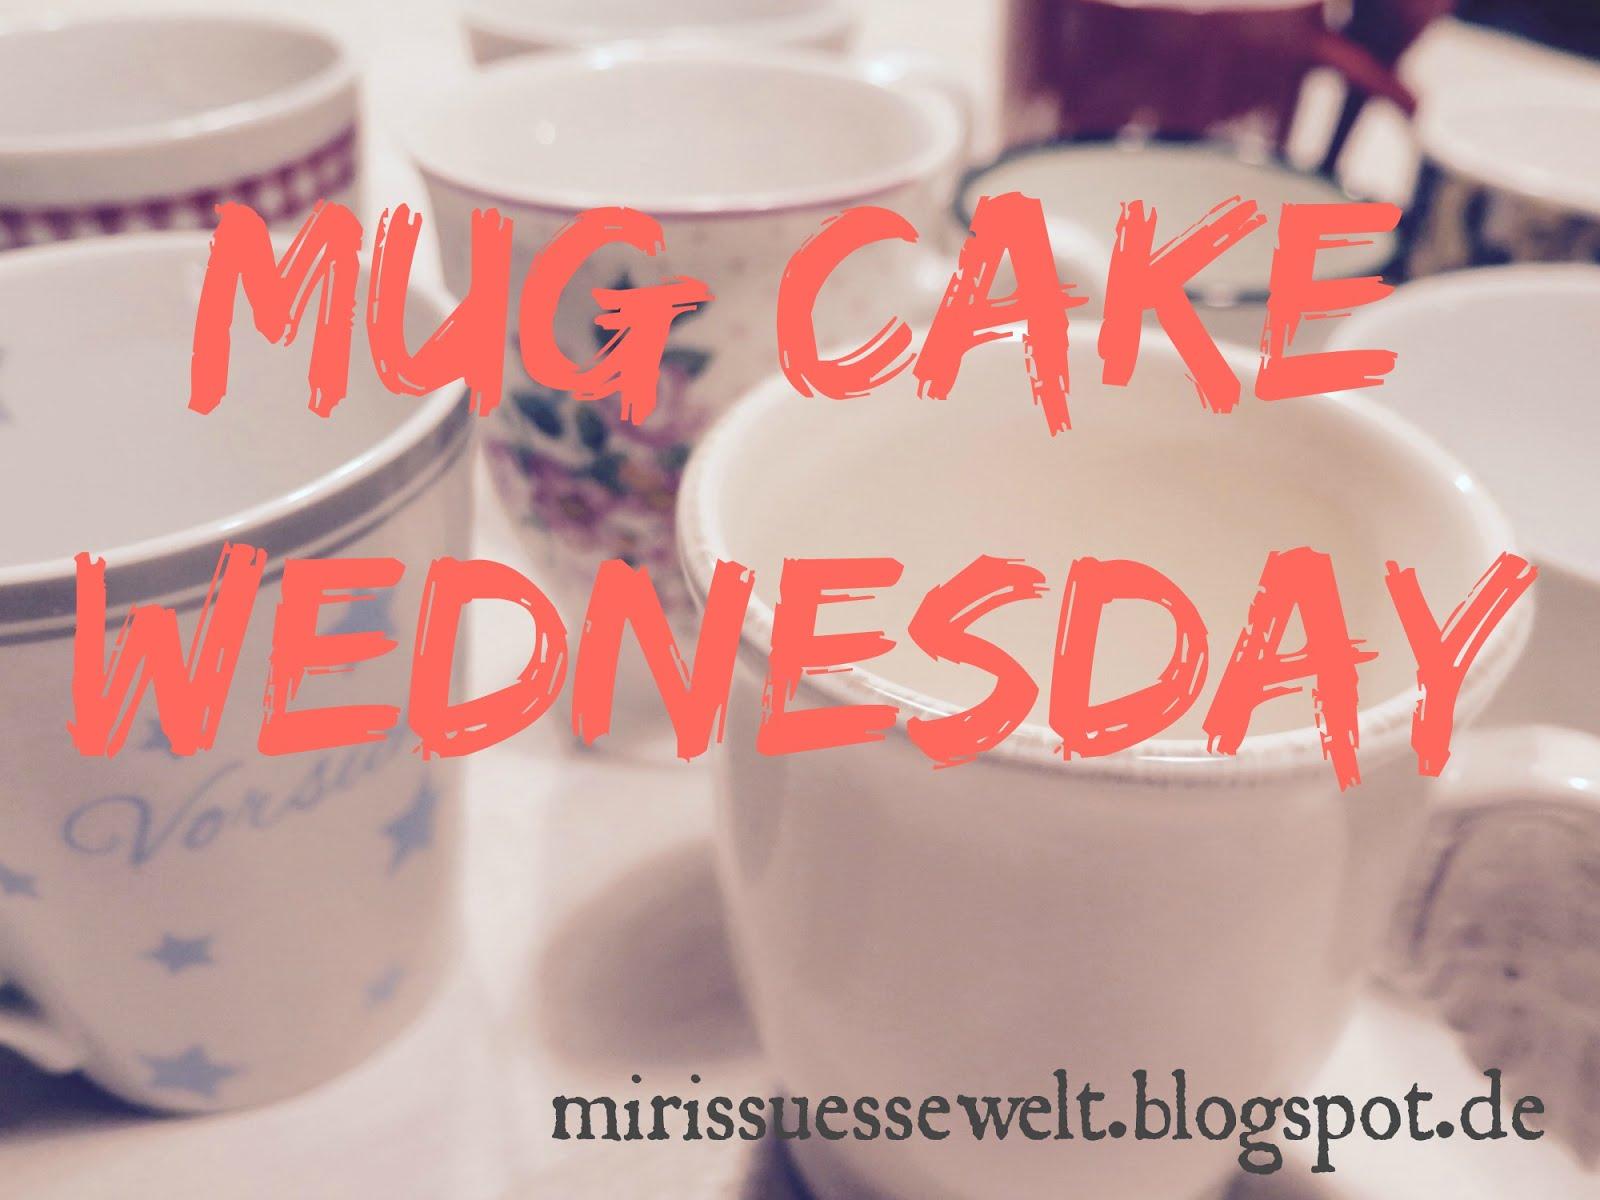 Mug Cakes Wednesday